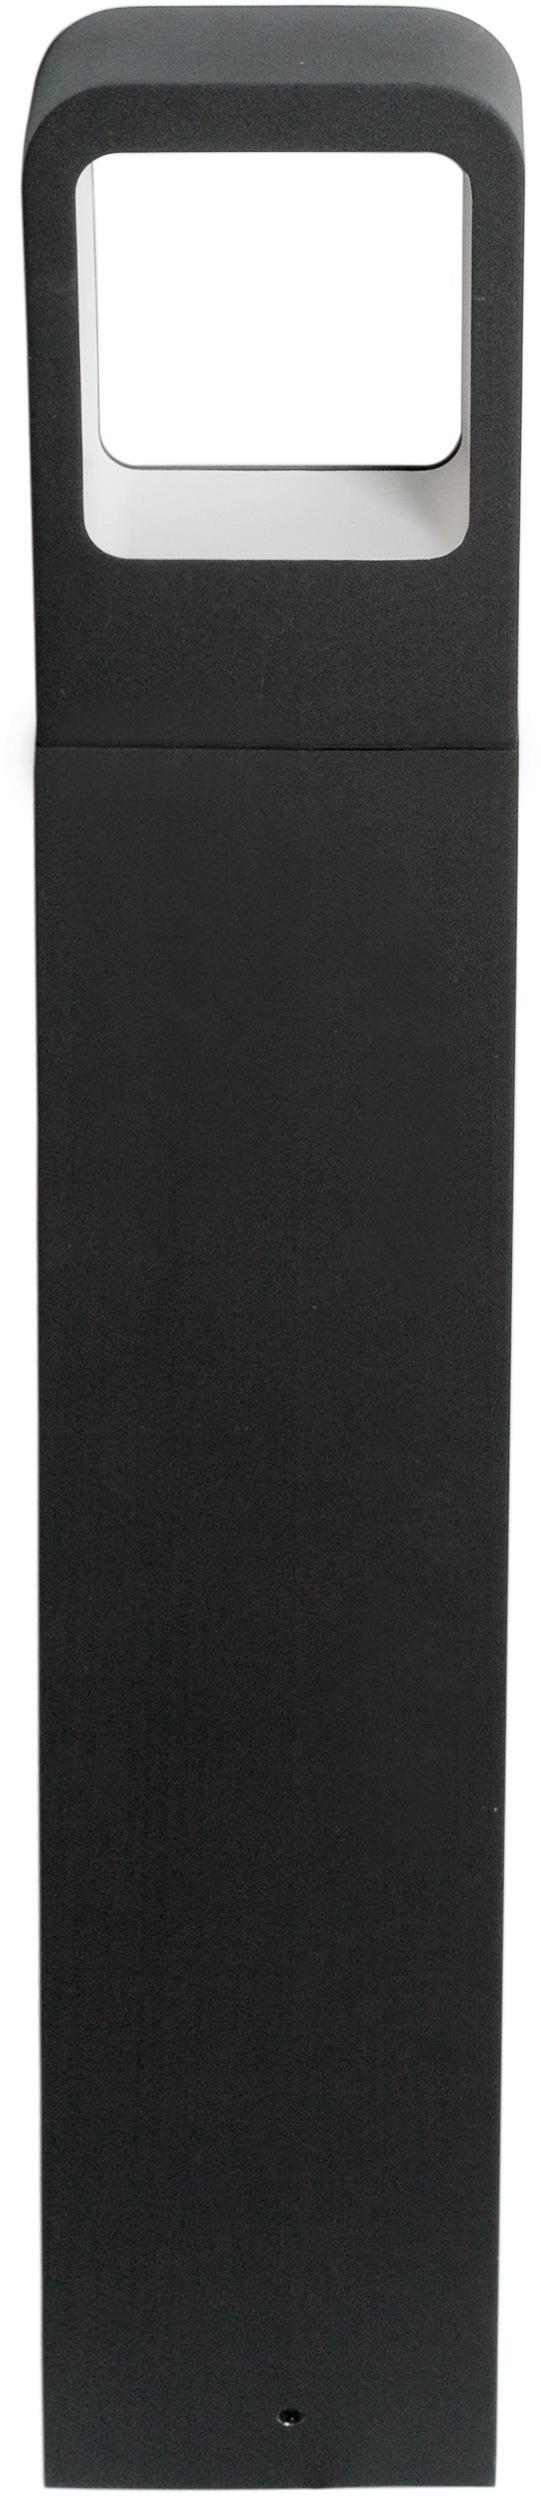 HEITRONIC LED Sockelleuchte Juna, LED-Modul, 1 St., Warmweiß, Indirekter Lichtaustritt